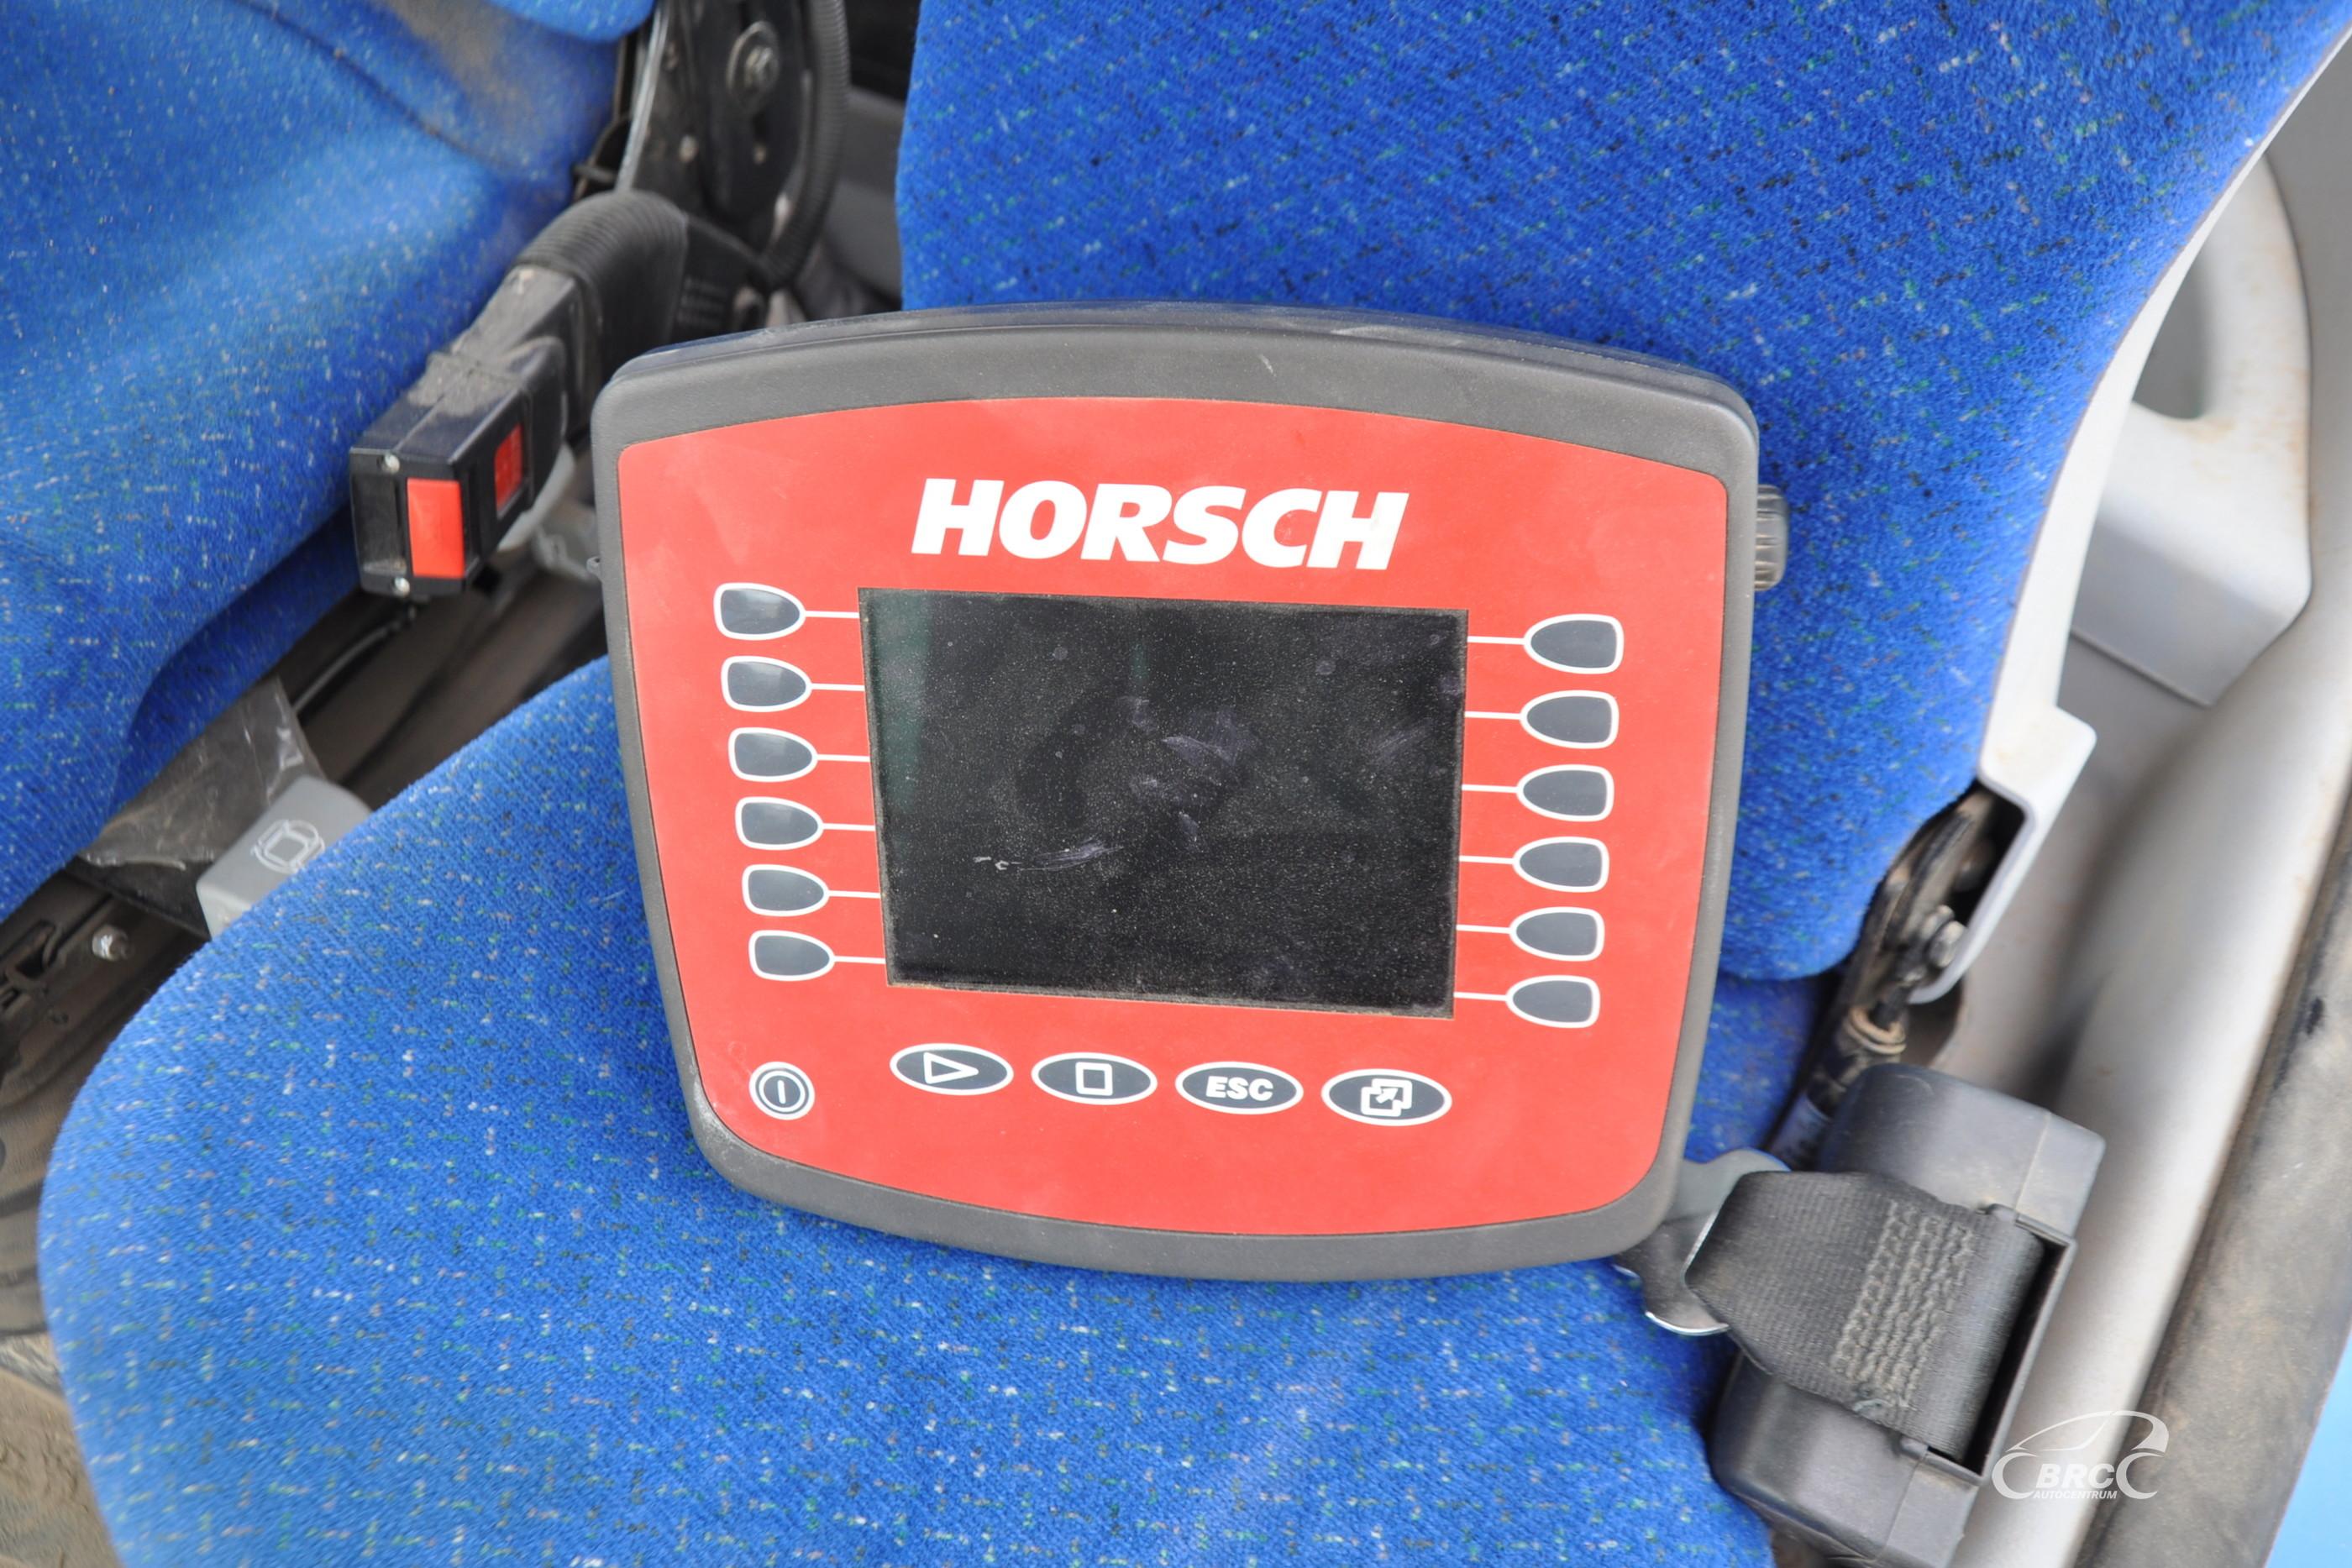 Horsch Pronto 8DC